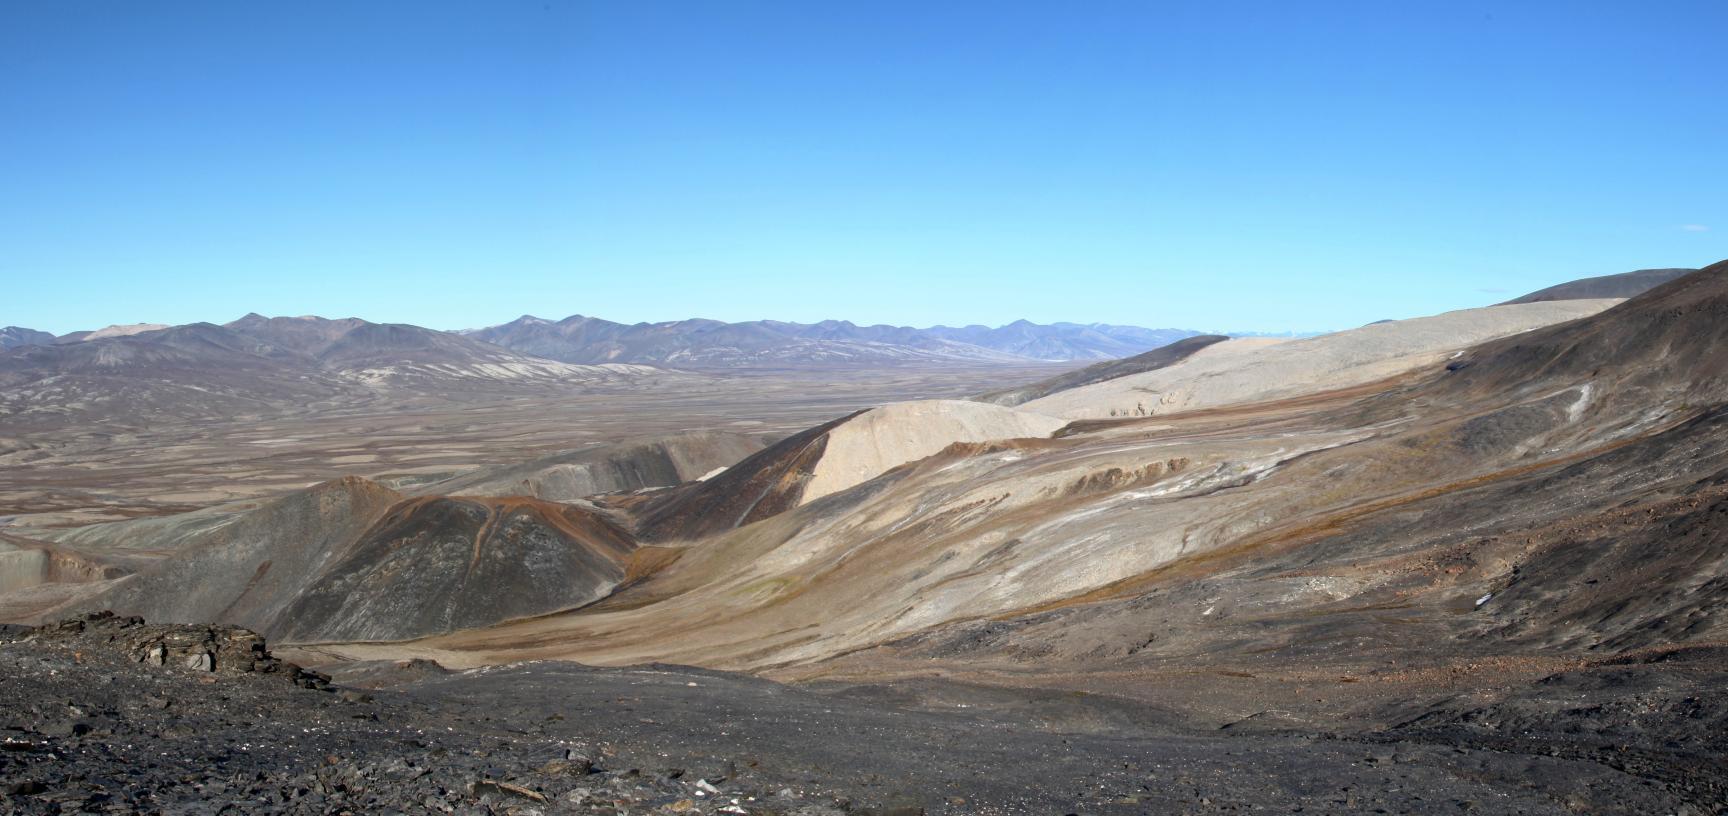 Sirius Passet fossil locality